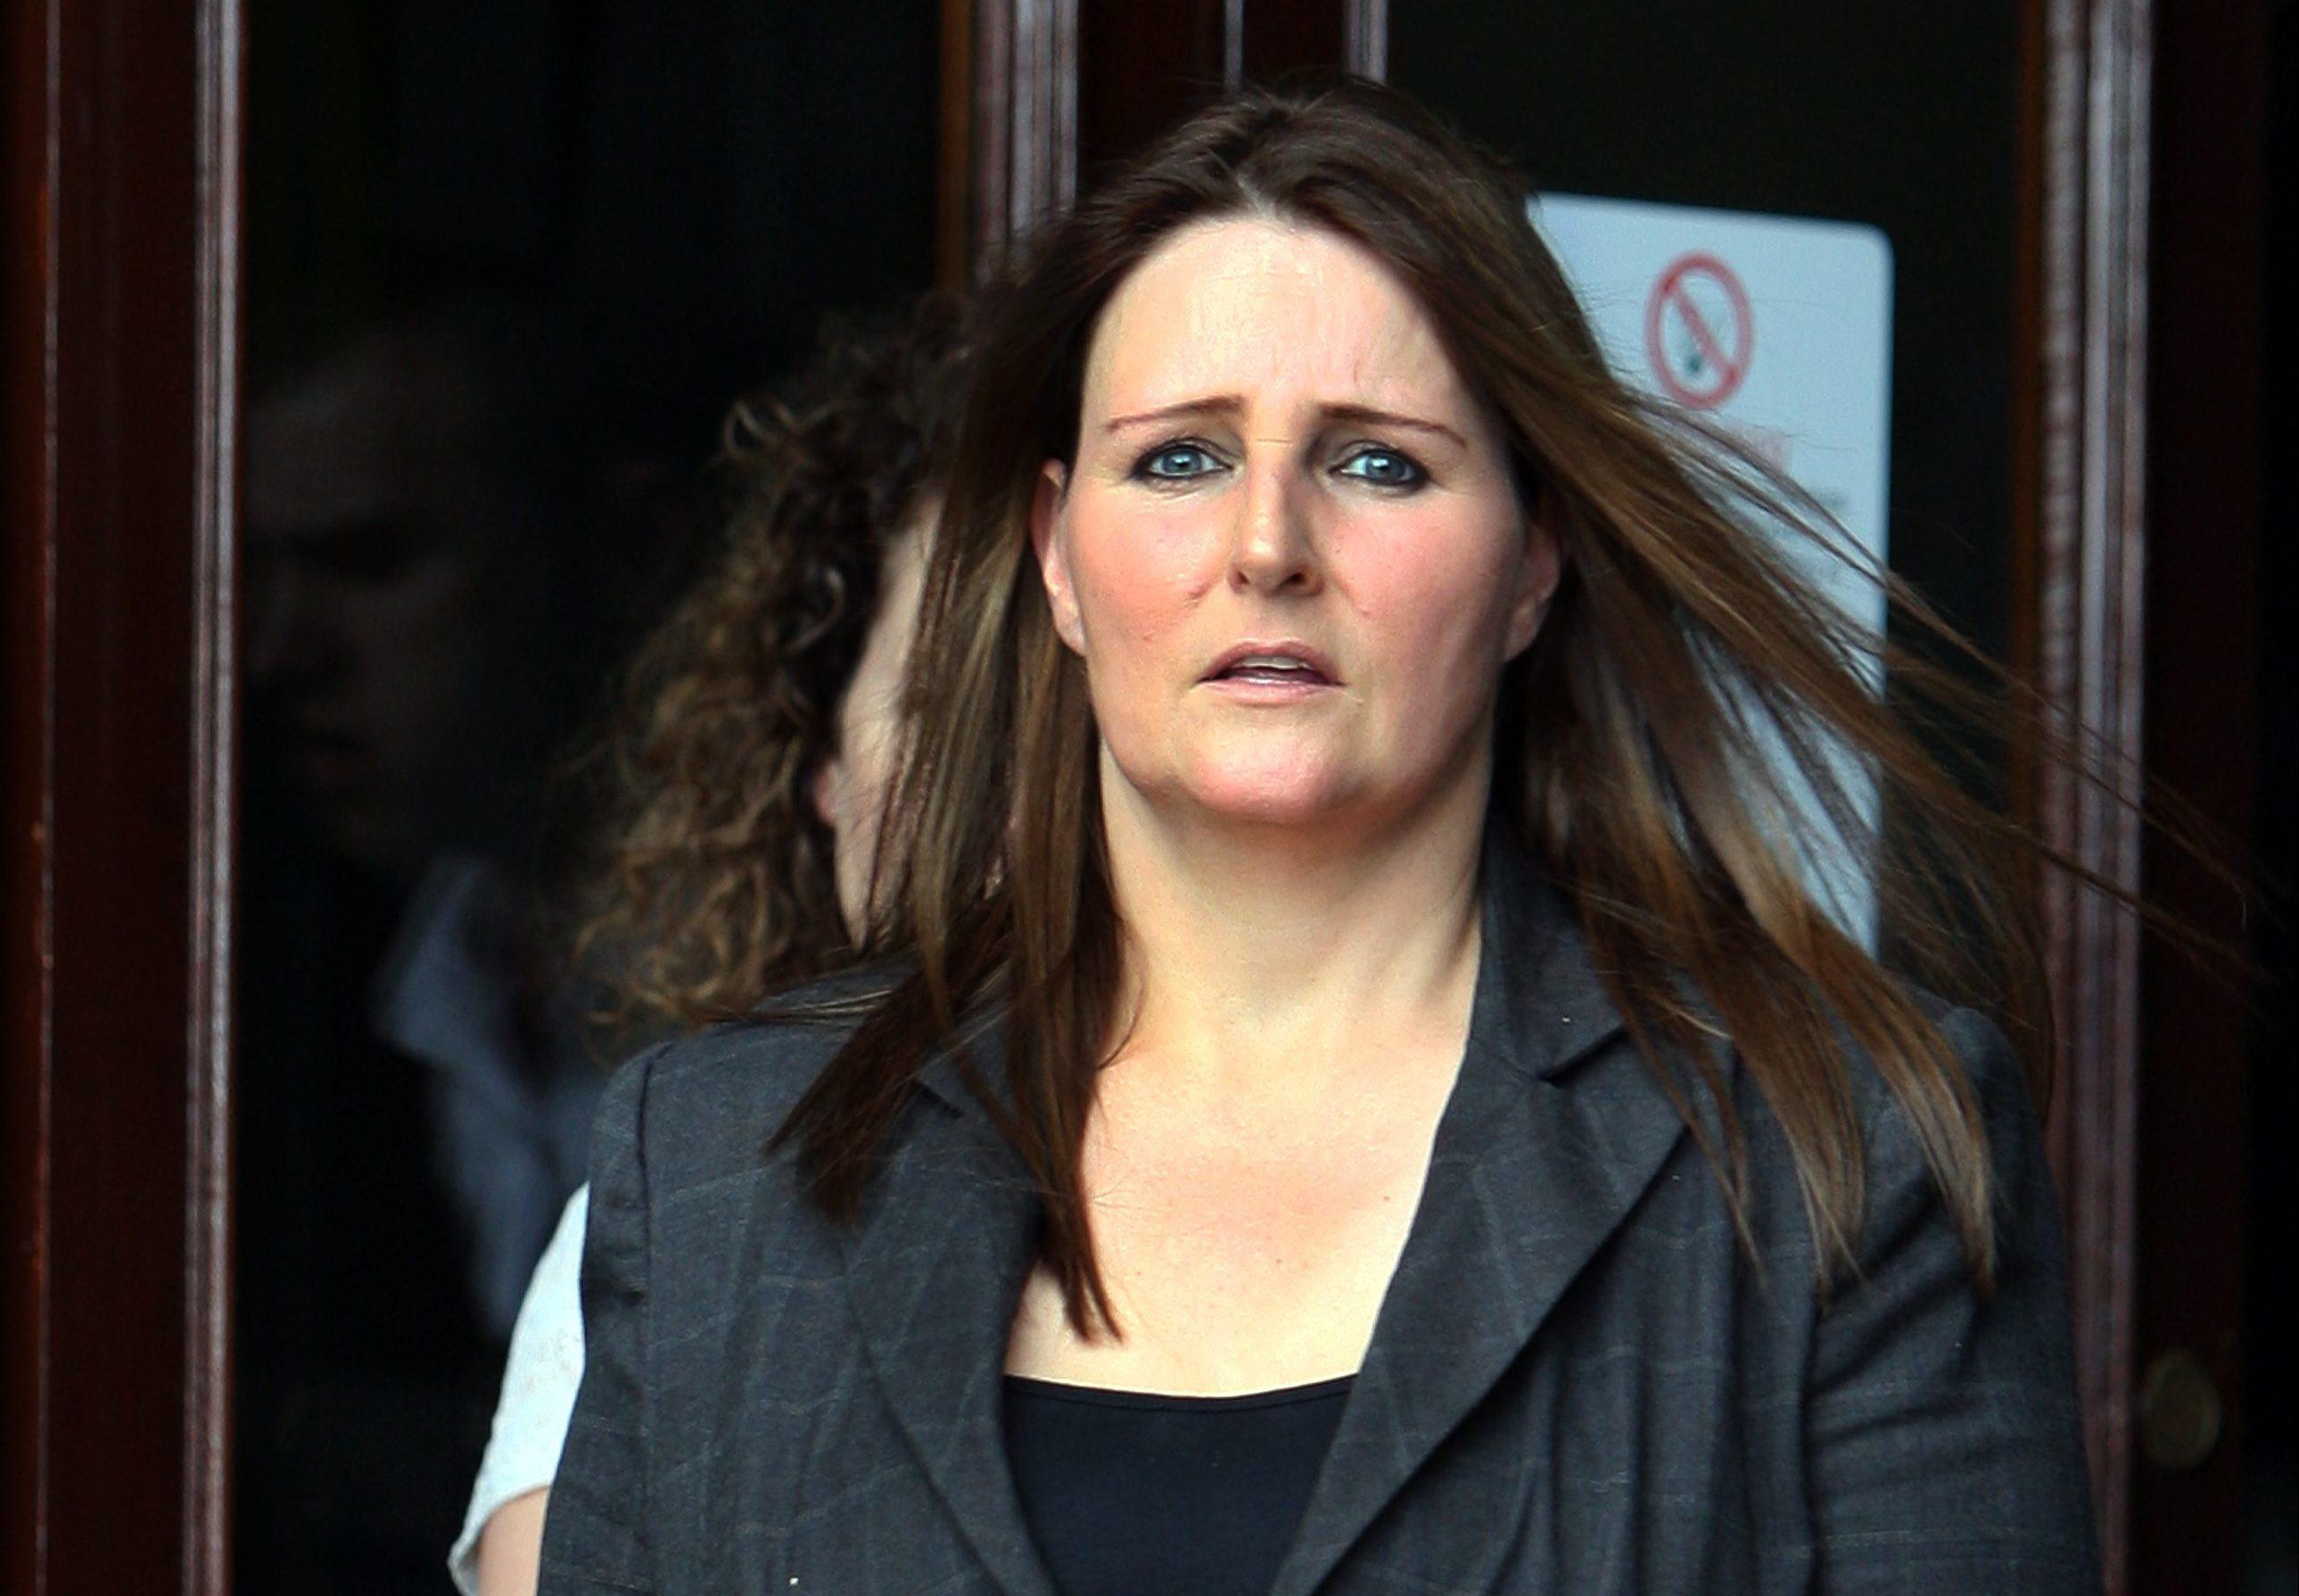 Susan Beattie at her sentencing in 2014.